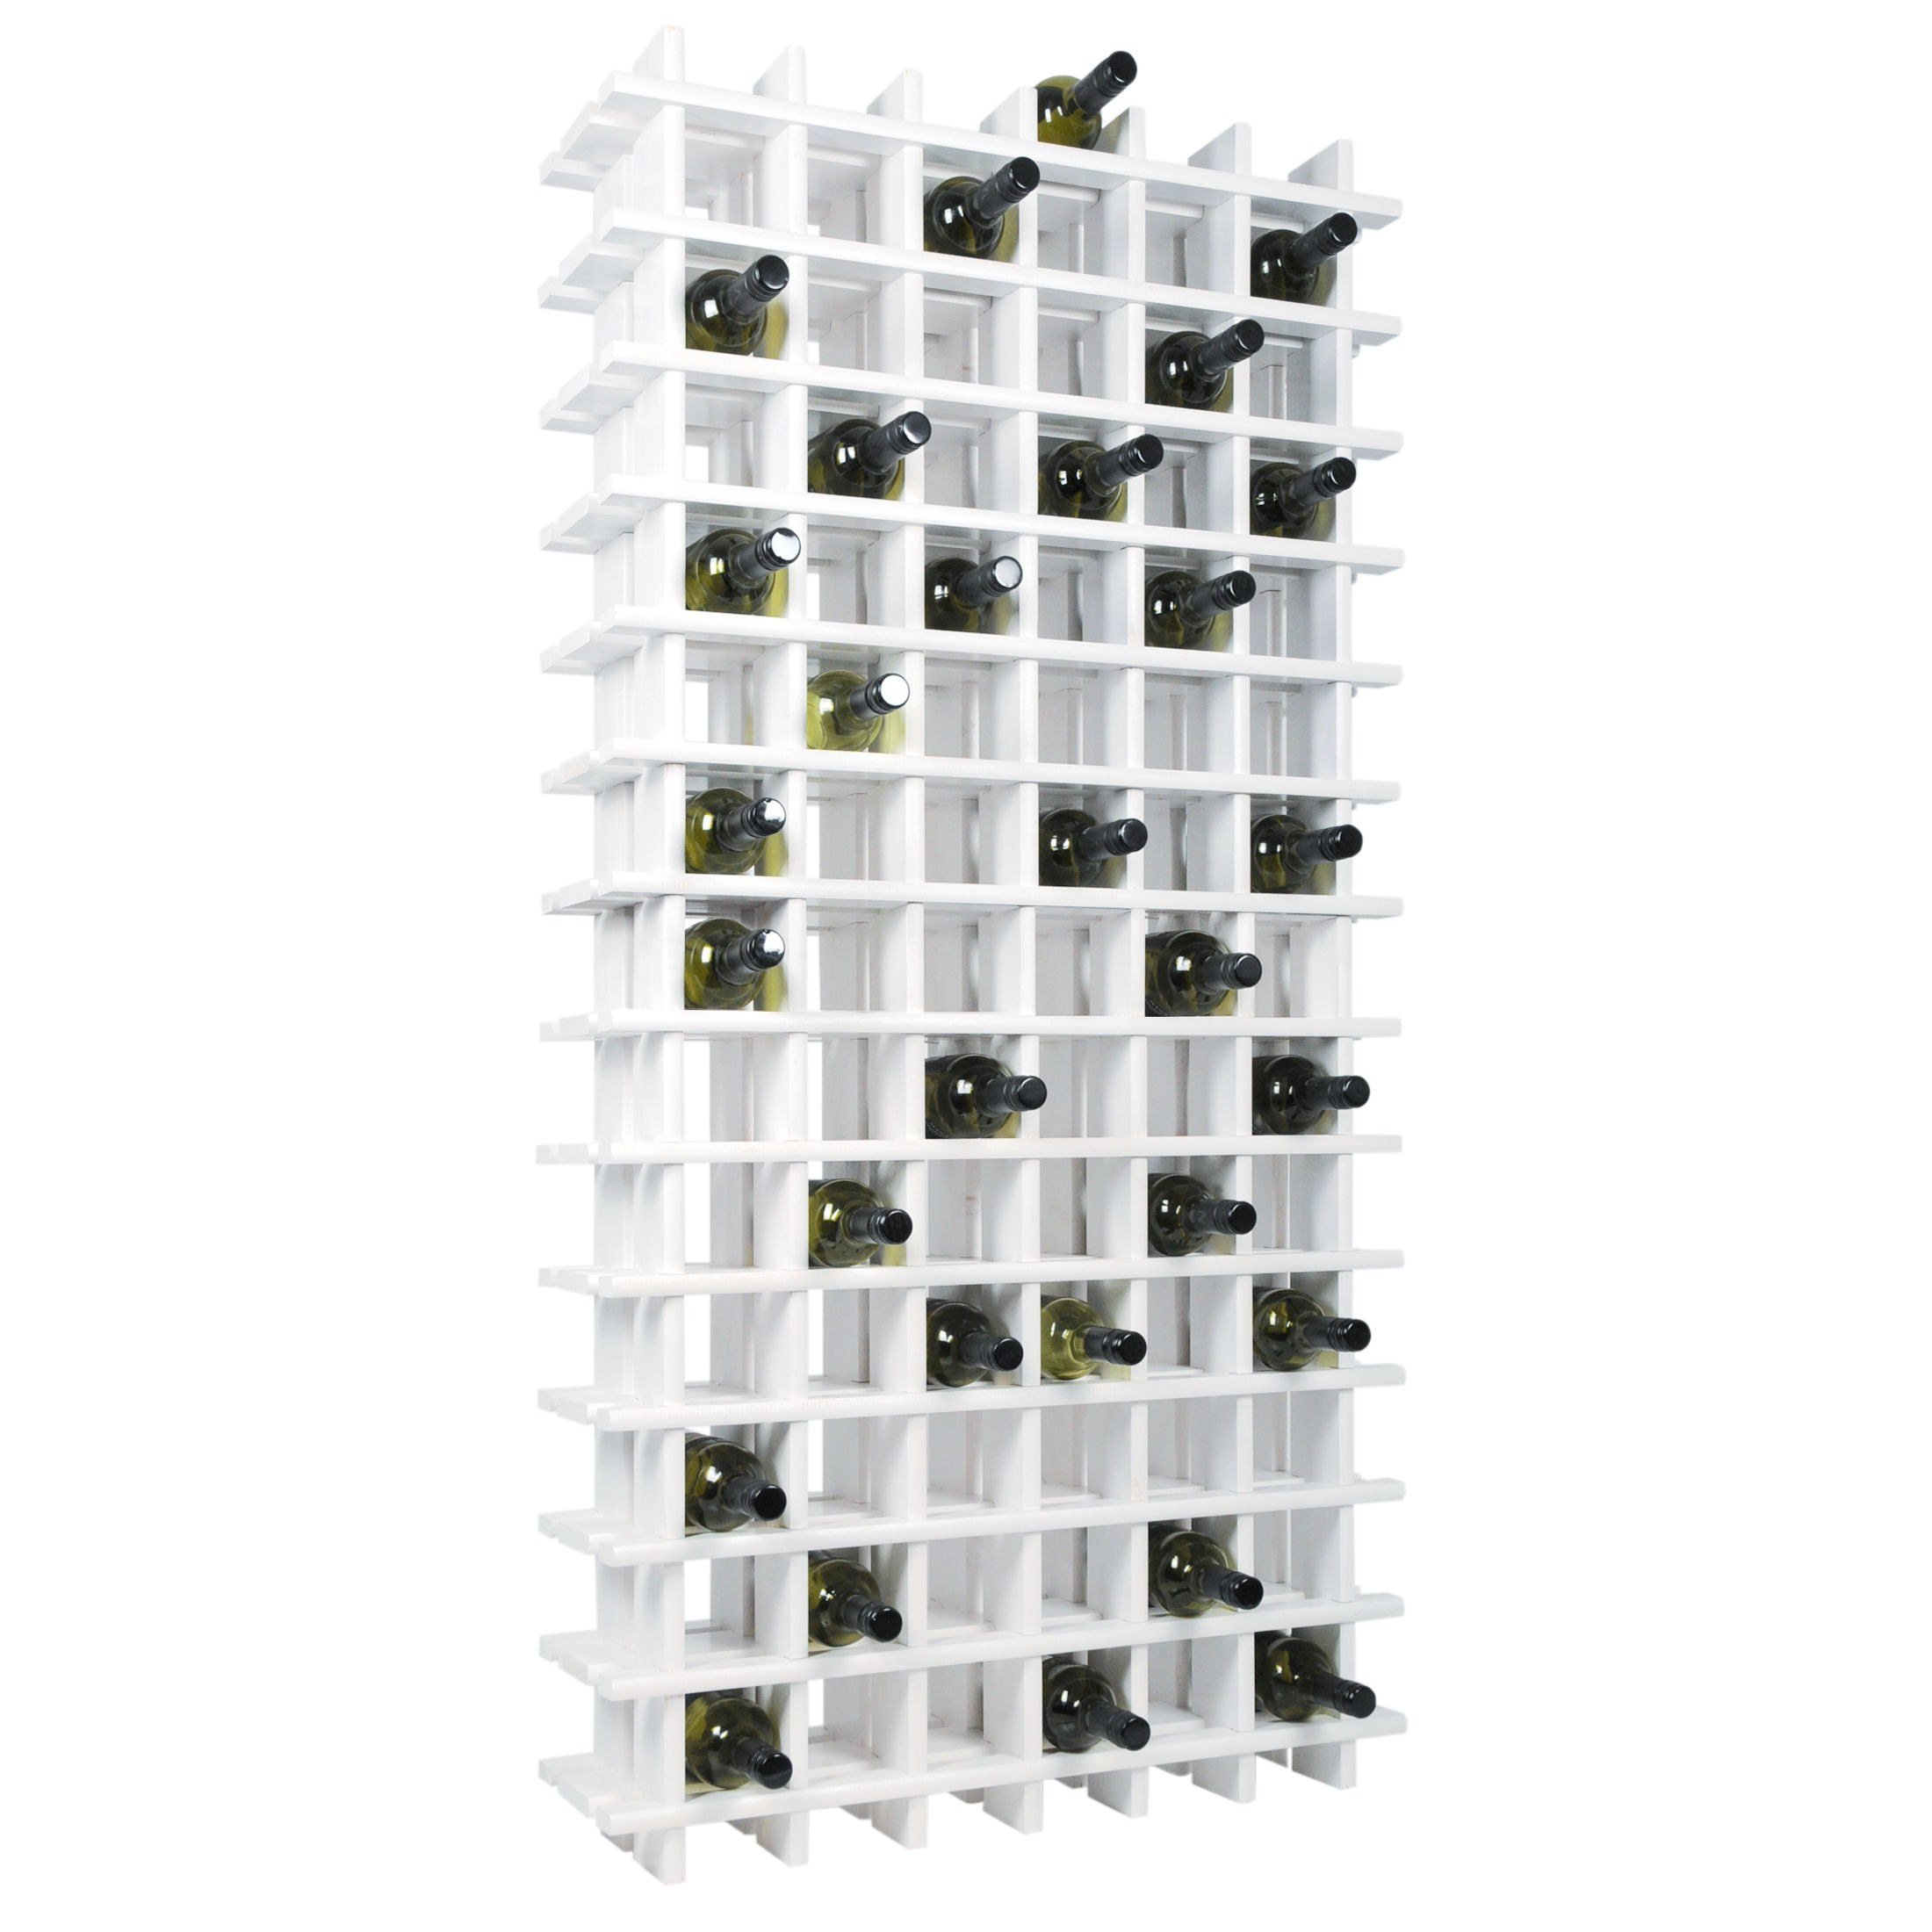 weinregal flaschenregal system primavino holz kiefer wei stapelbar erwei ebay. Black Bedroom Furniture Sets. Home Design Ideas